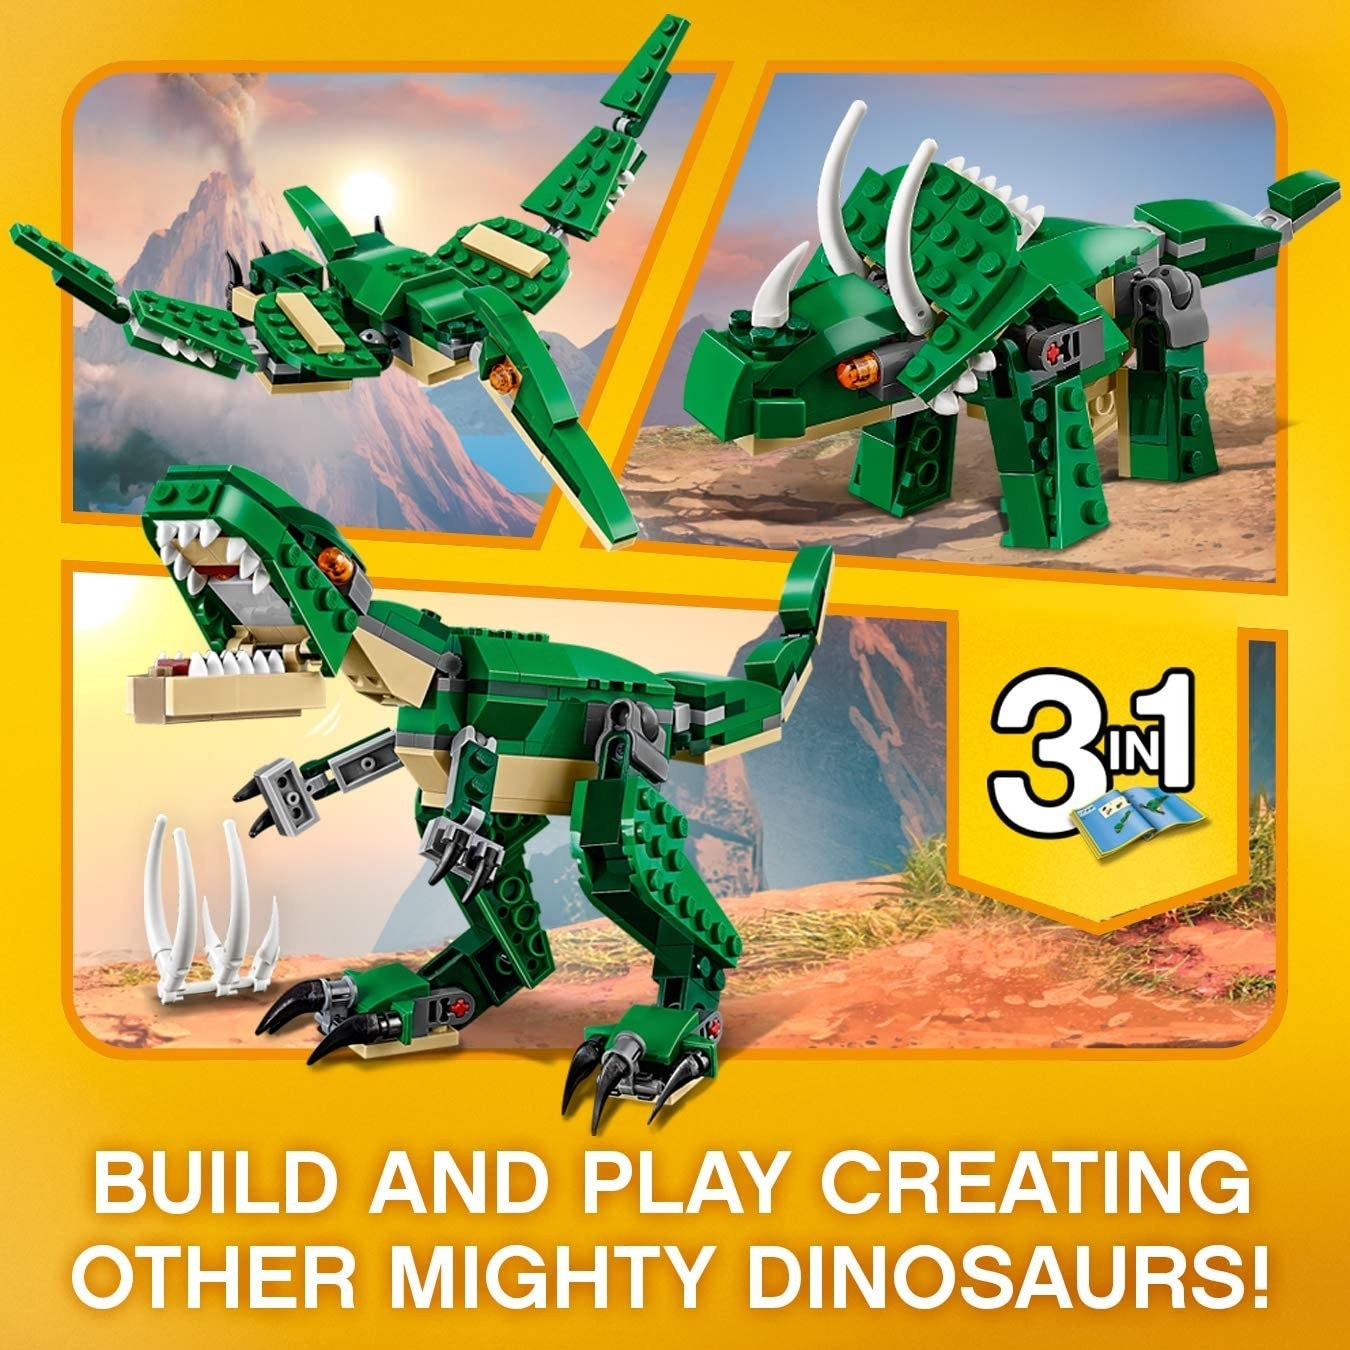 dinosaur lego set